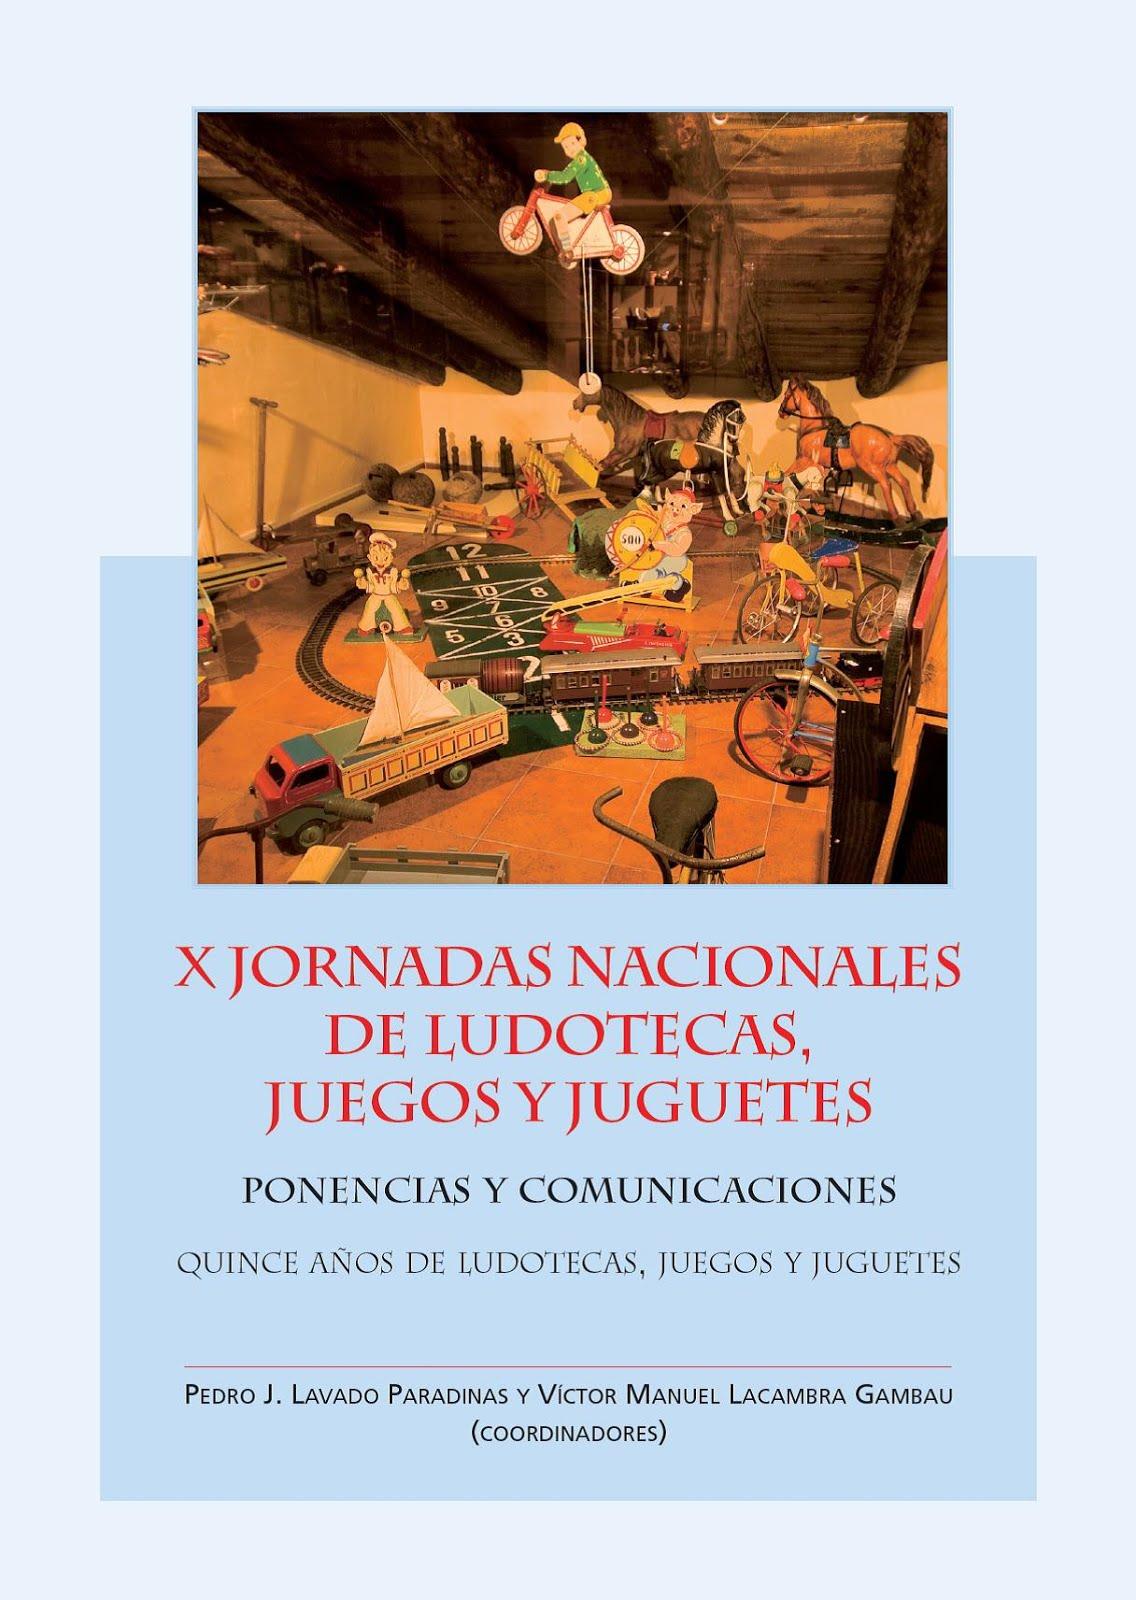 X Jornadas Nacionales de Ludotecas